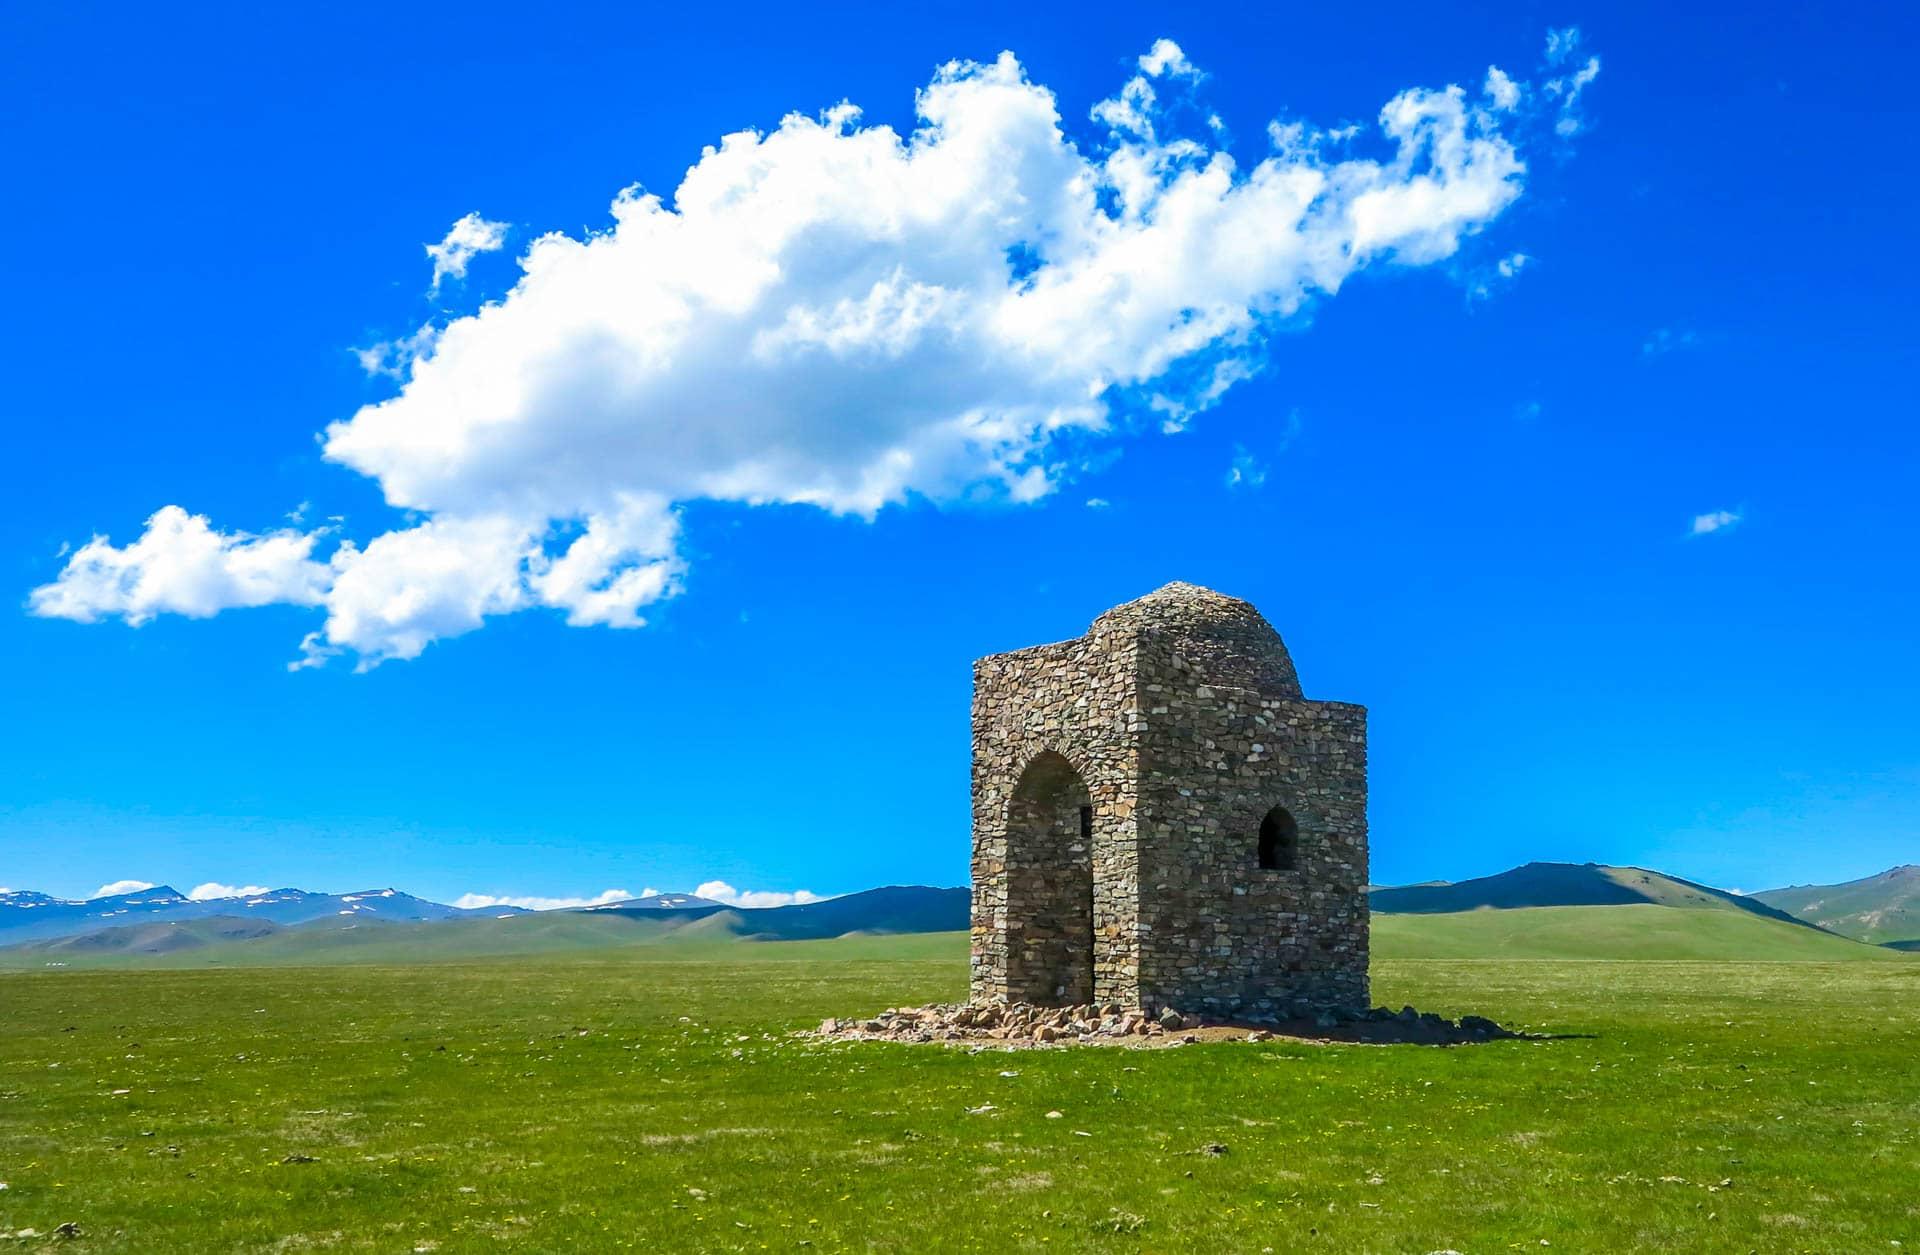 Central Asia Guide mountains, high plane, mausoleum, son kul lake